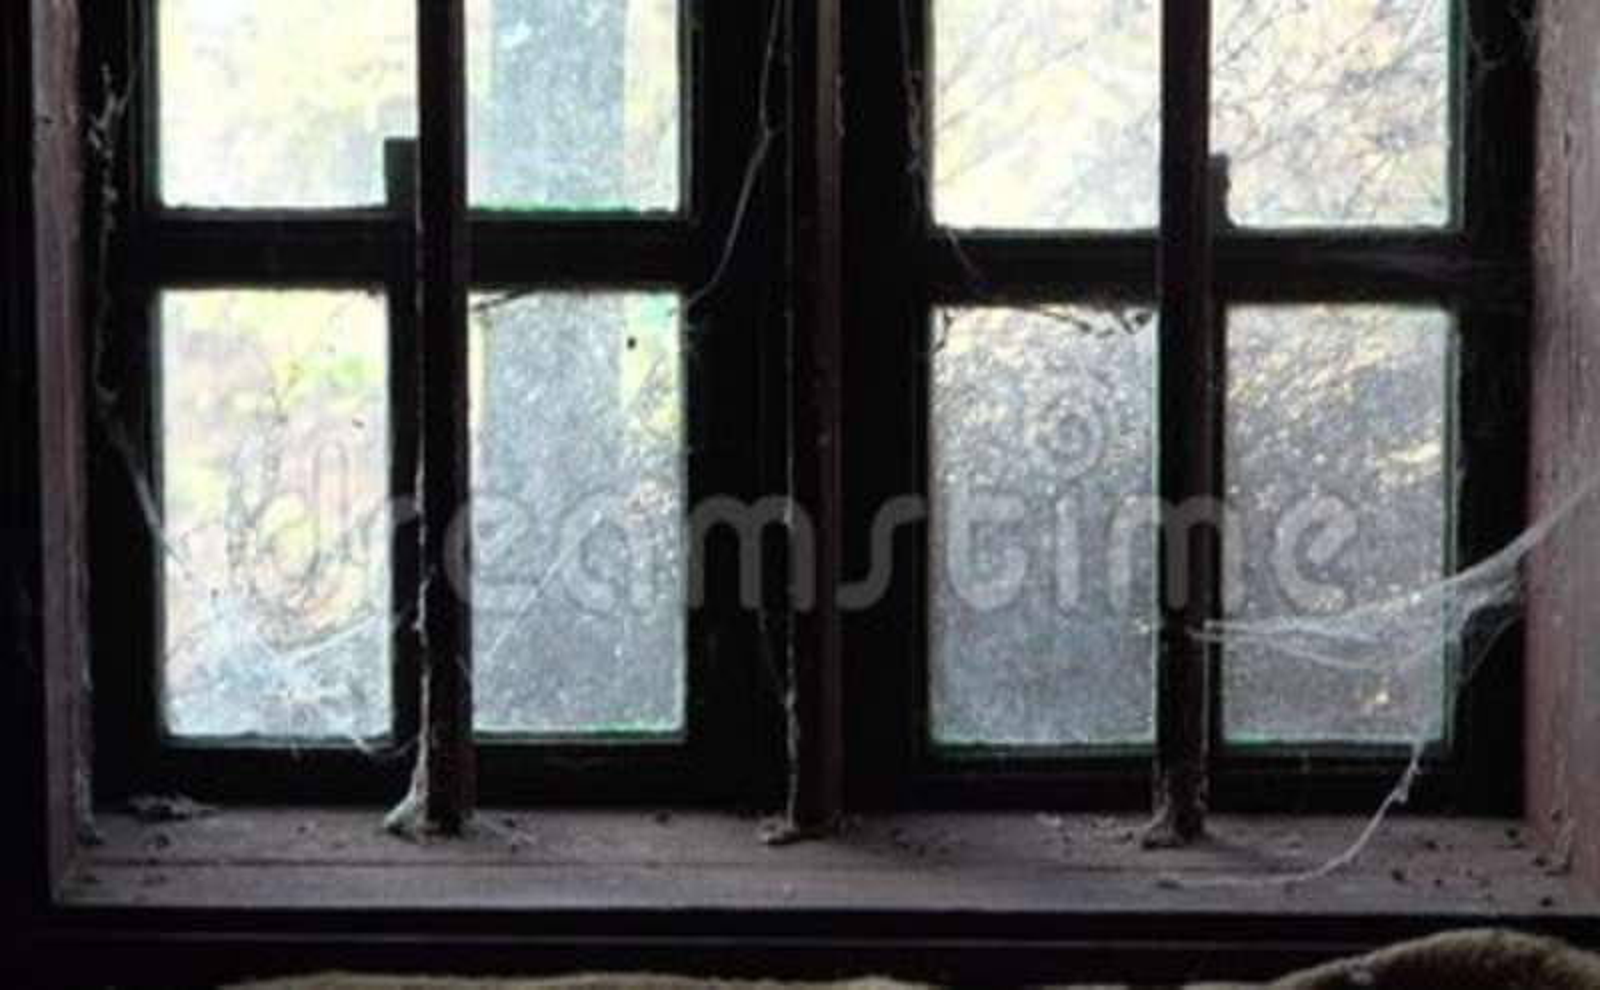 Haunted Old Abandoned House Window